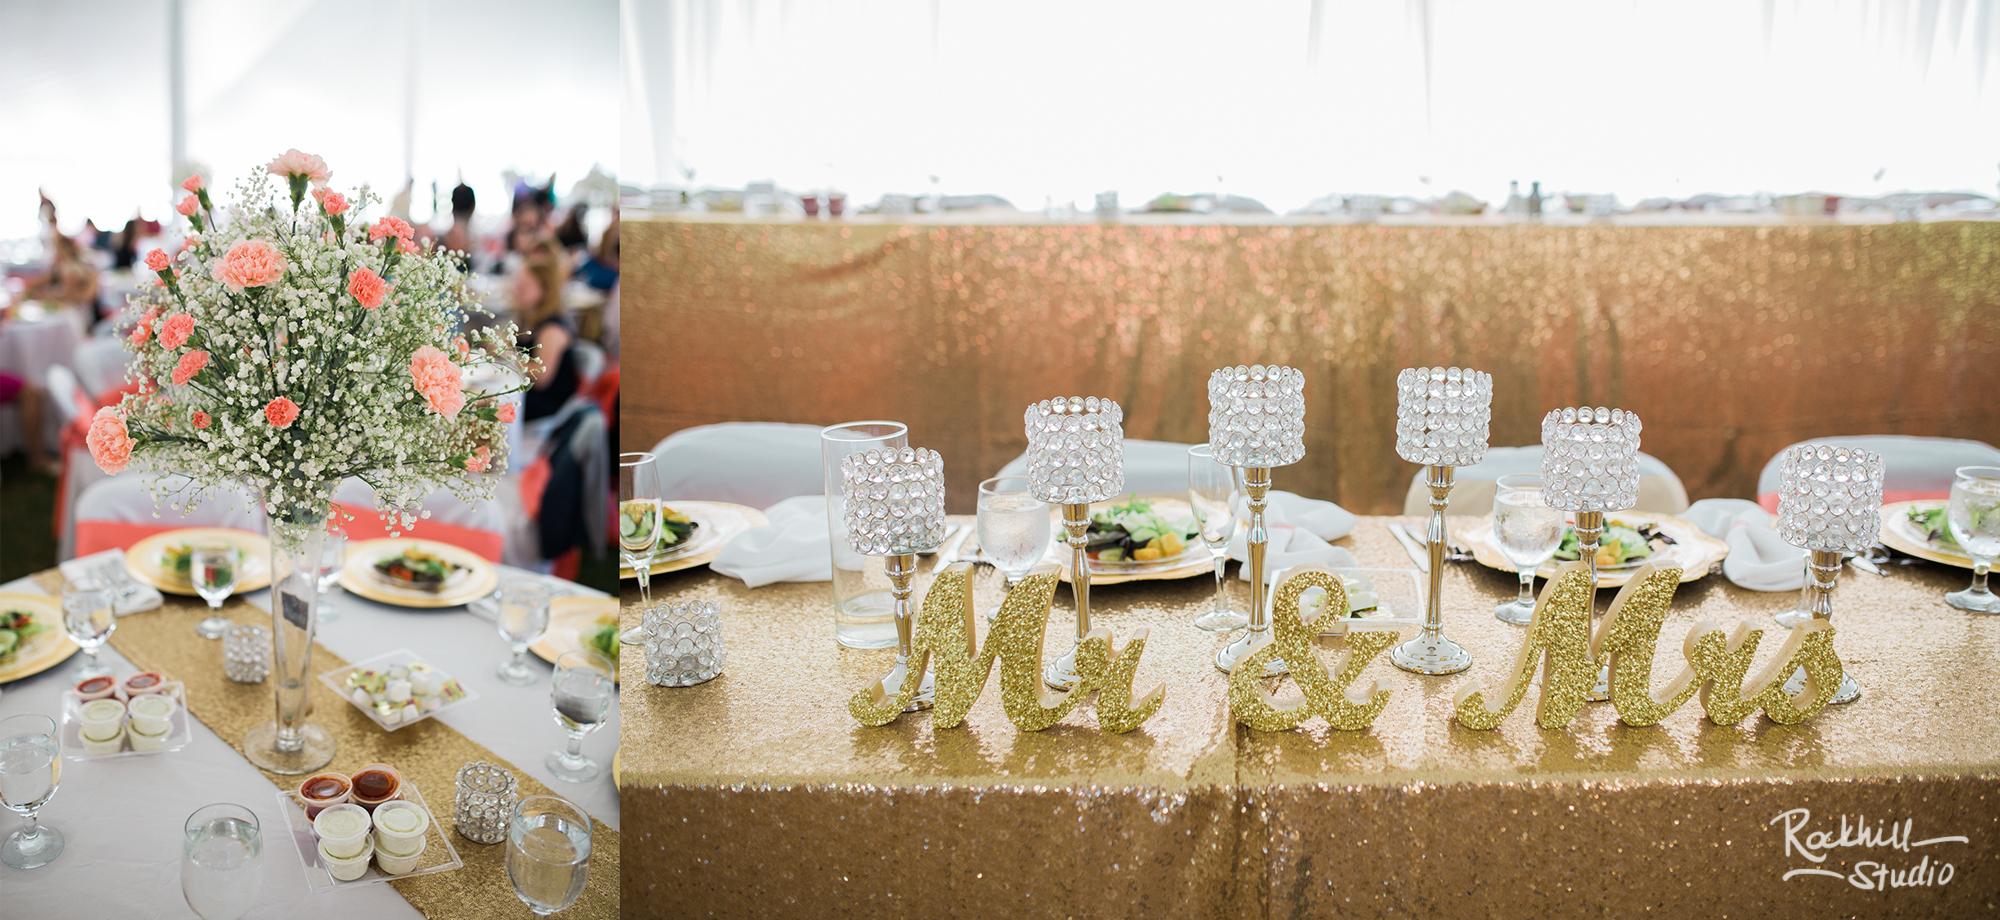 rockhill-studio-michigan-wedding-photography-gold-decor-table.jpg